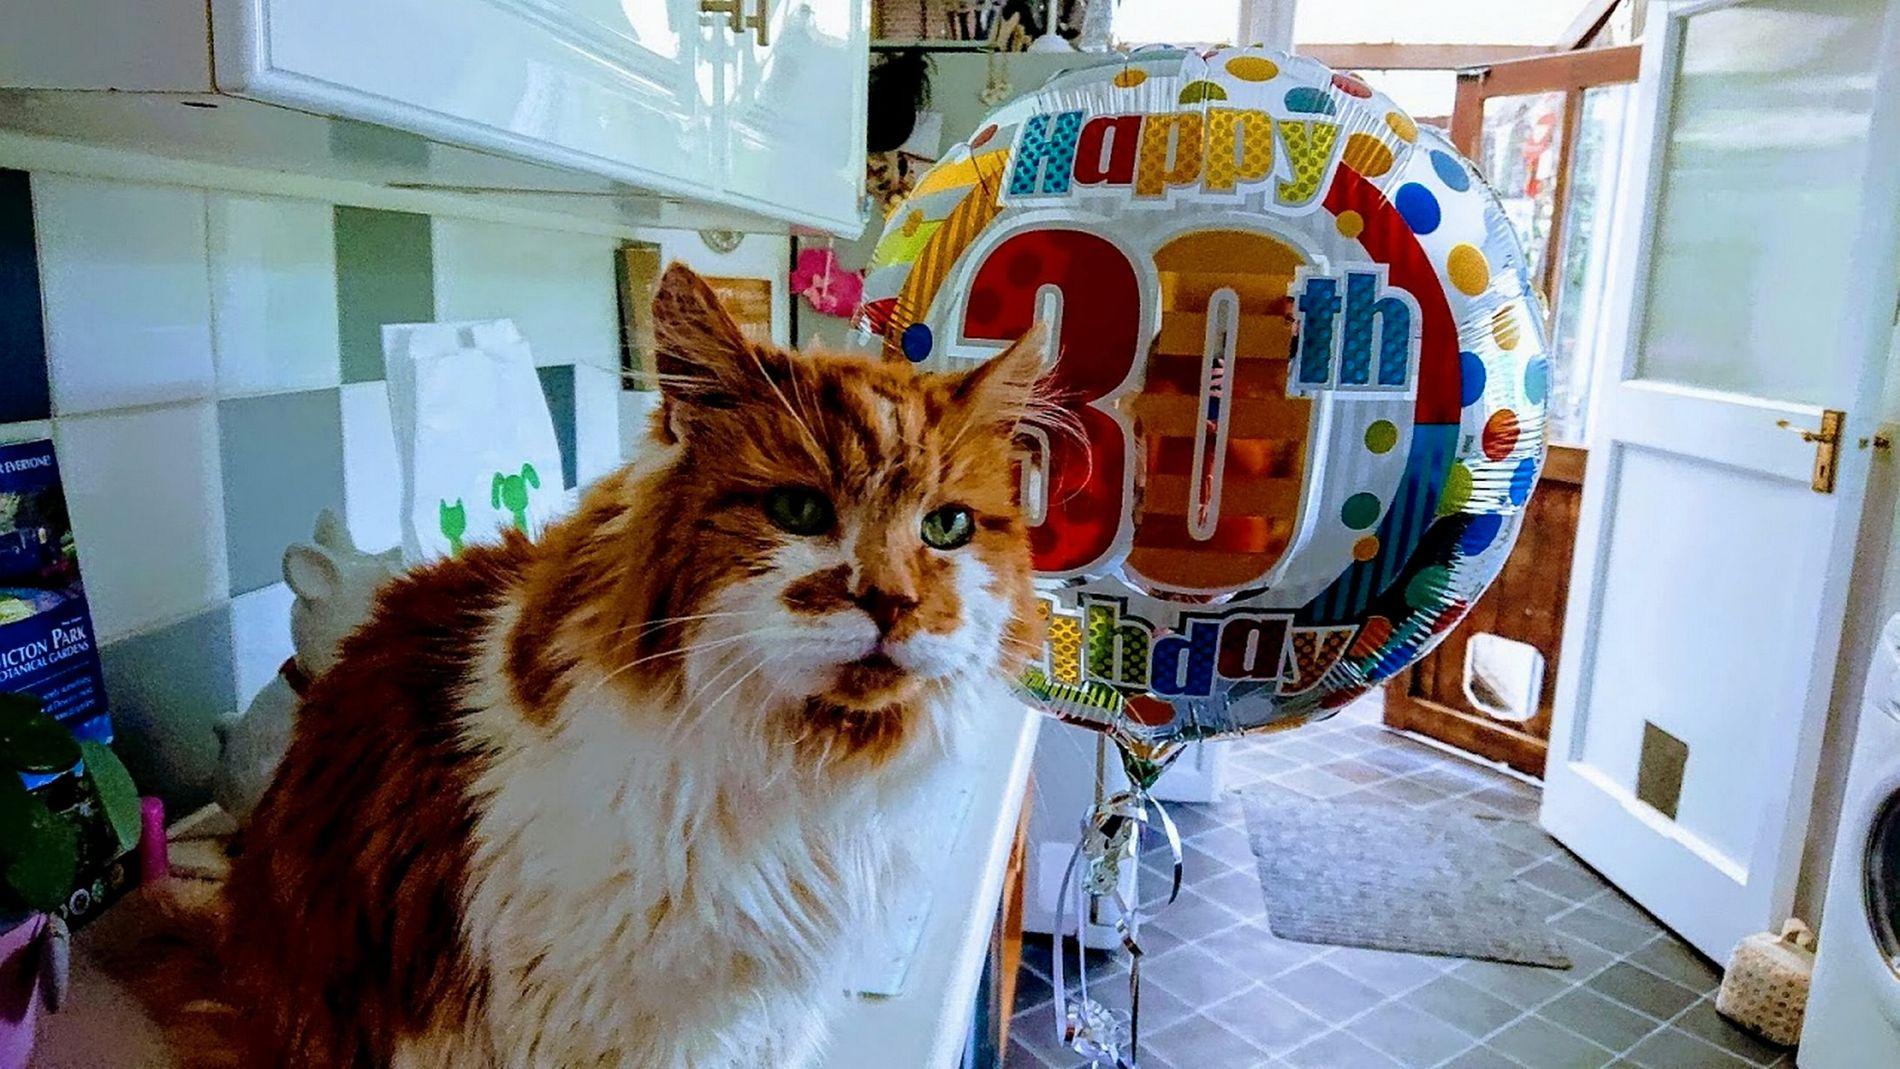 PUS-HER 30: Rubble ble født i 1988 og lever fremdeles livets glade dager. Hurra!